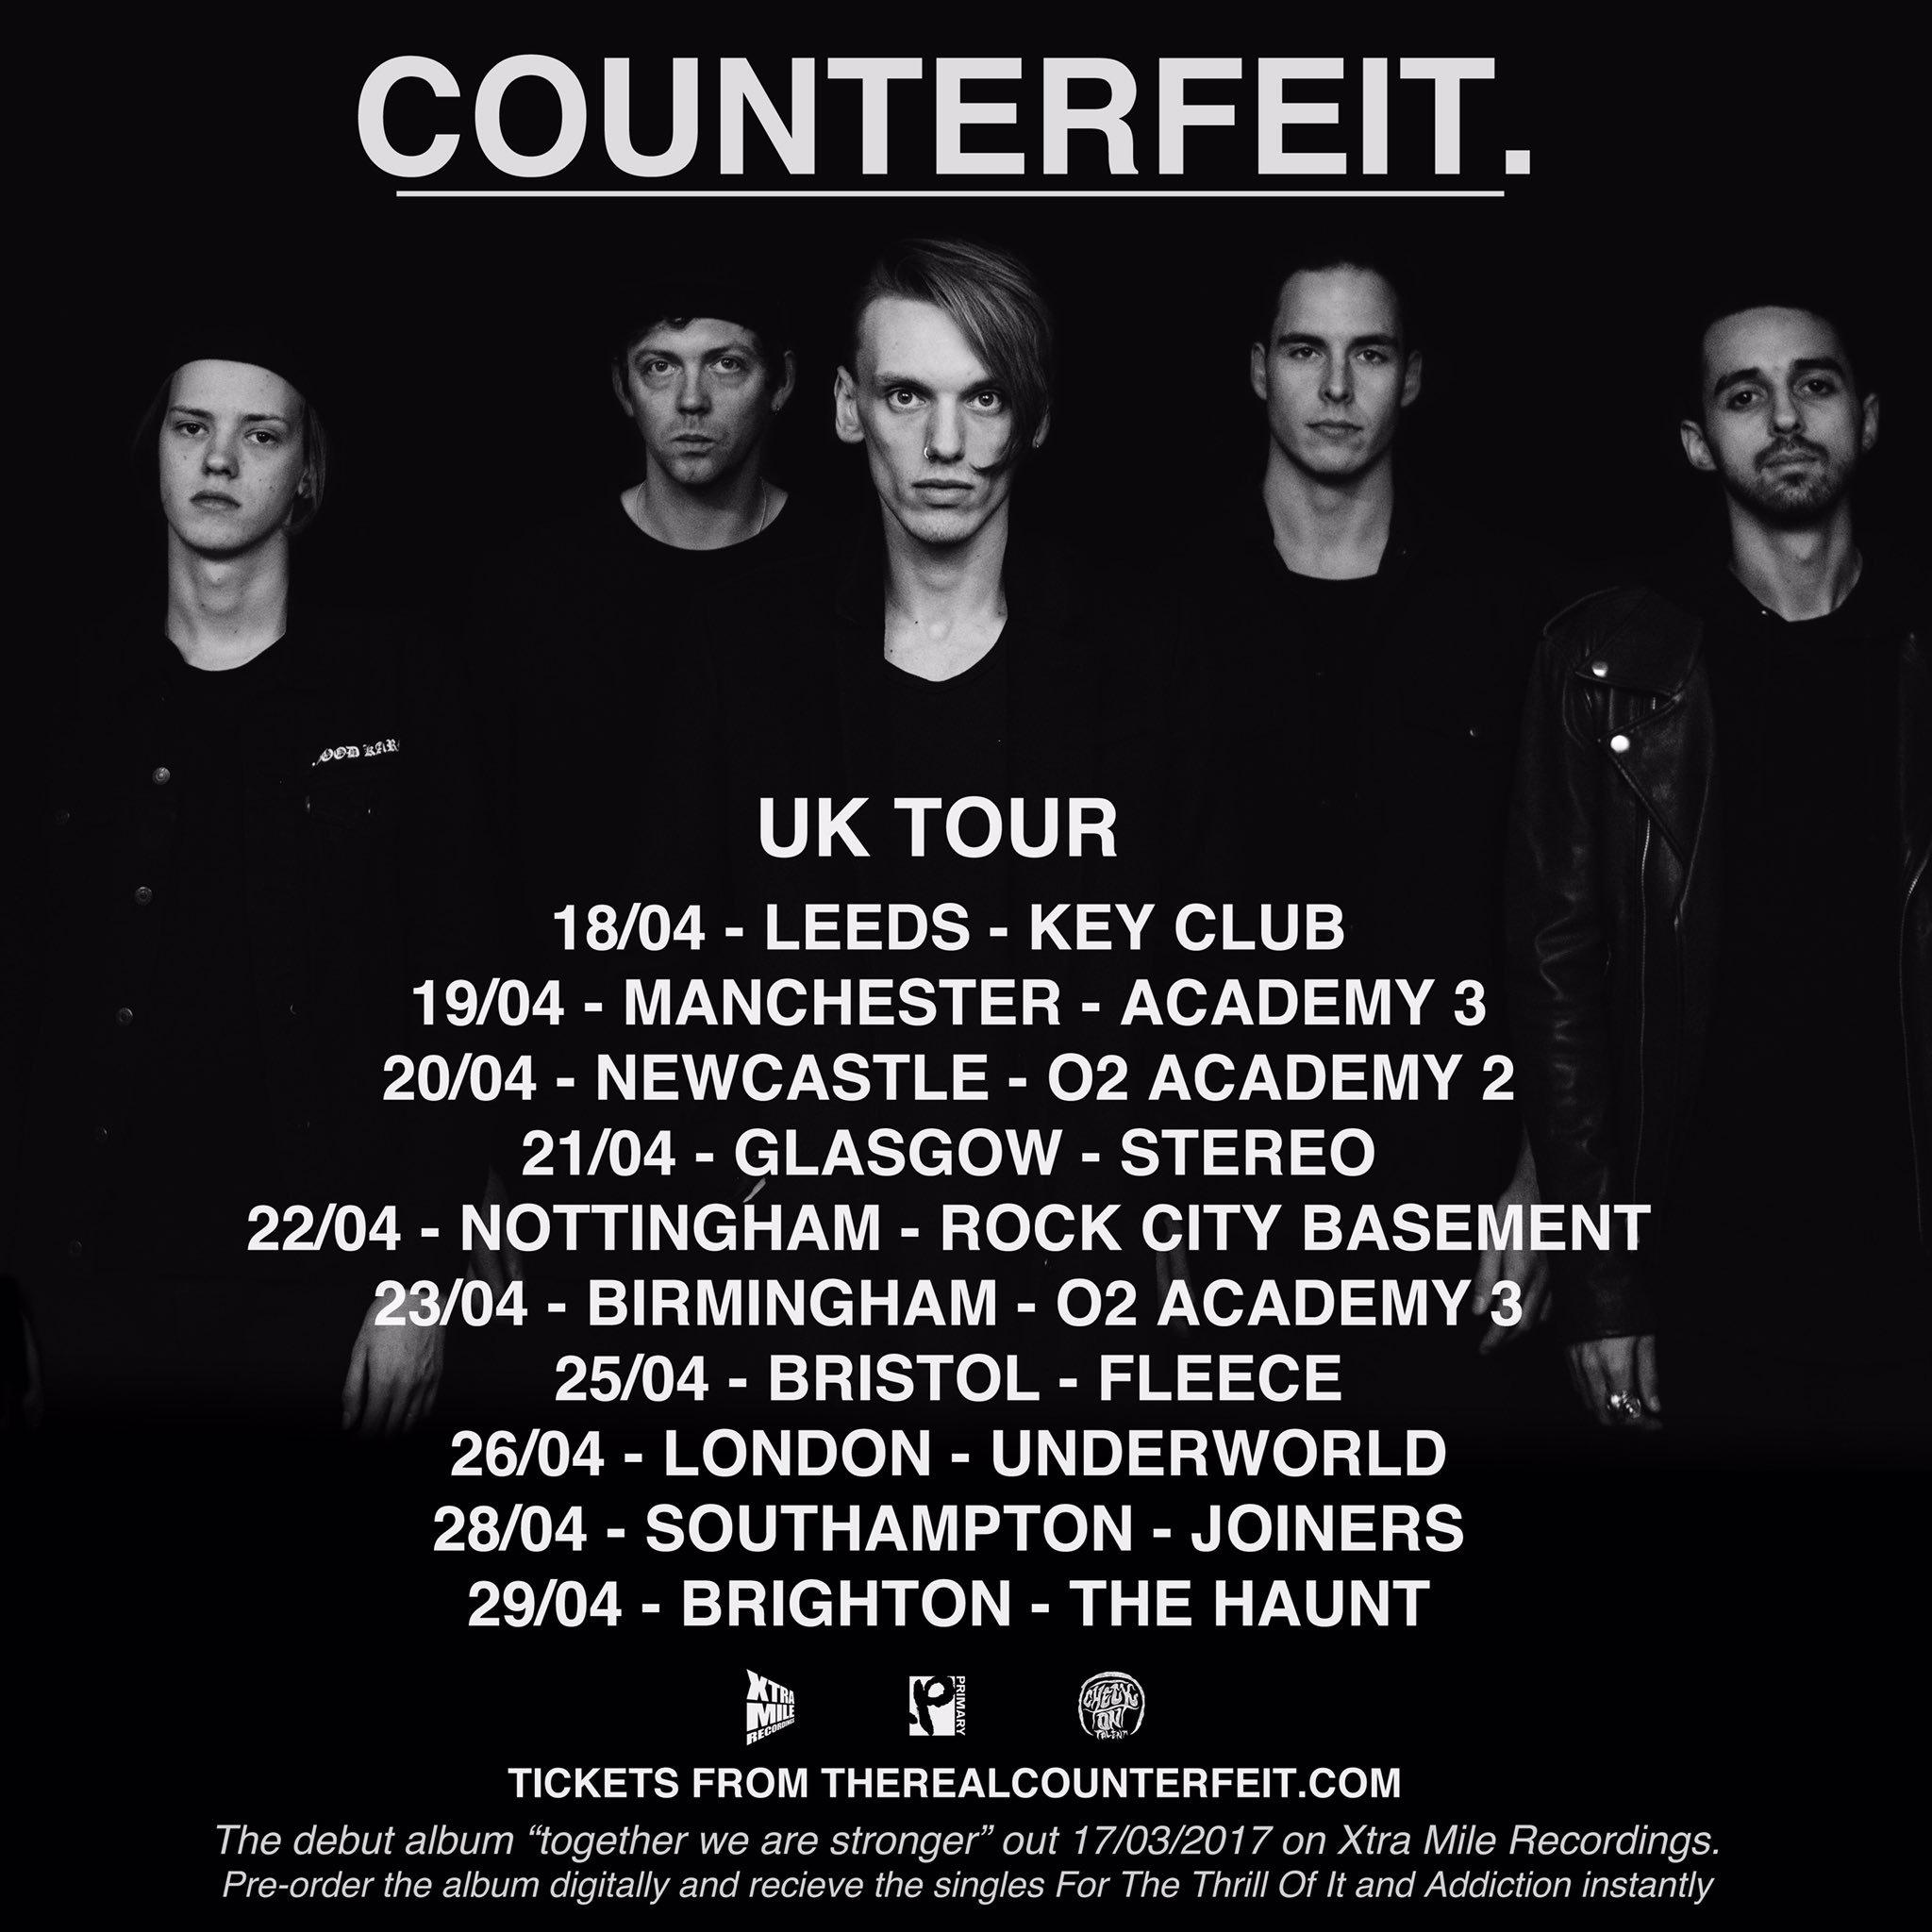 UK friends. We're back out pon da road. https://t.co/e0hl3zOFHo if you're keen @counterfeitrock Bye. https://t.co/QEc1XrJP1y